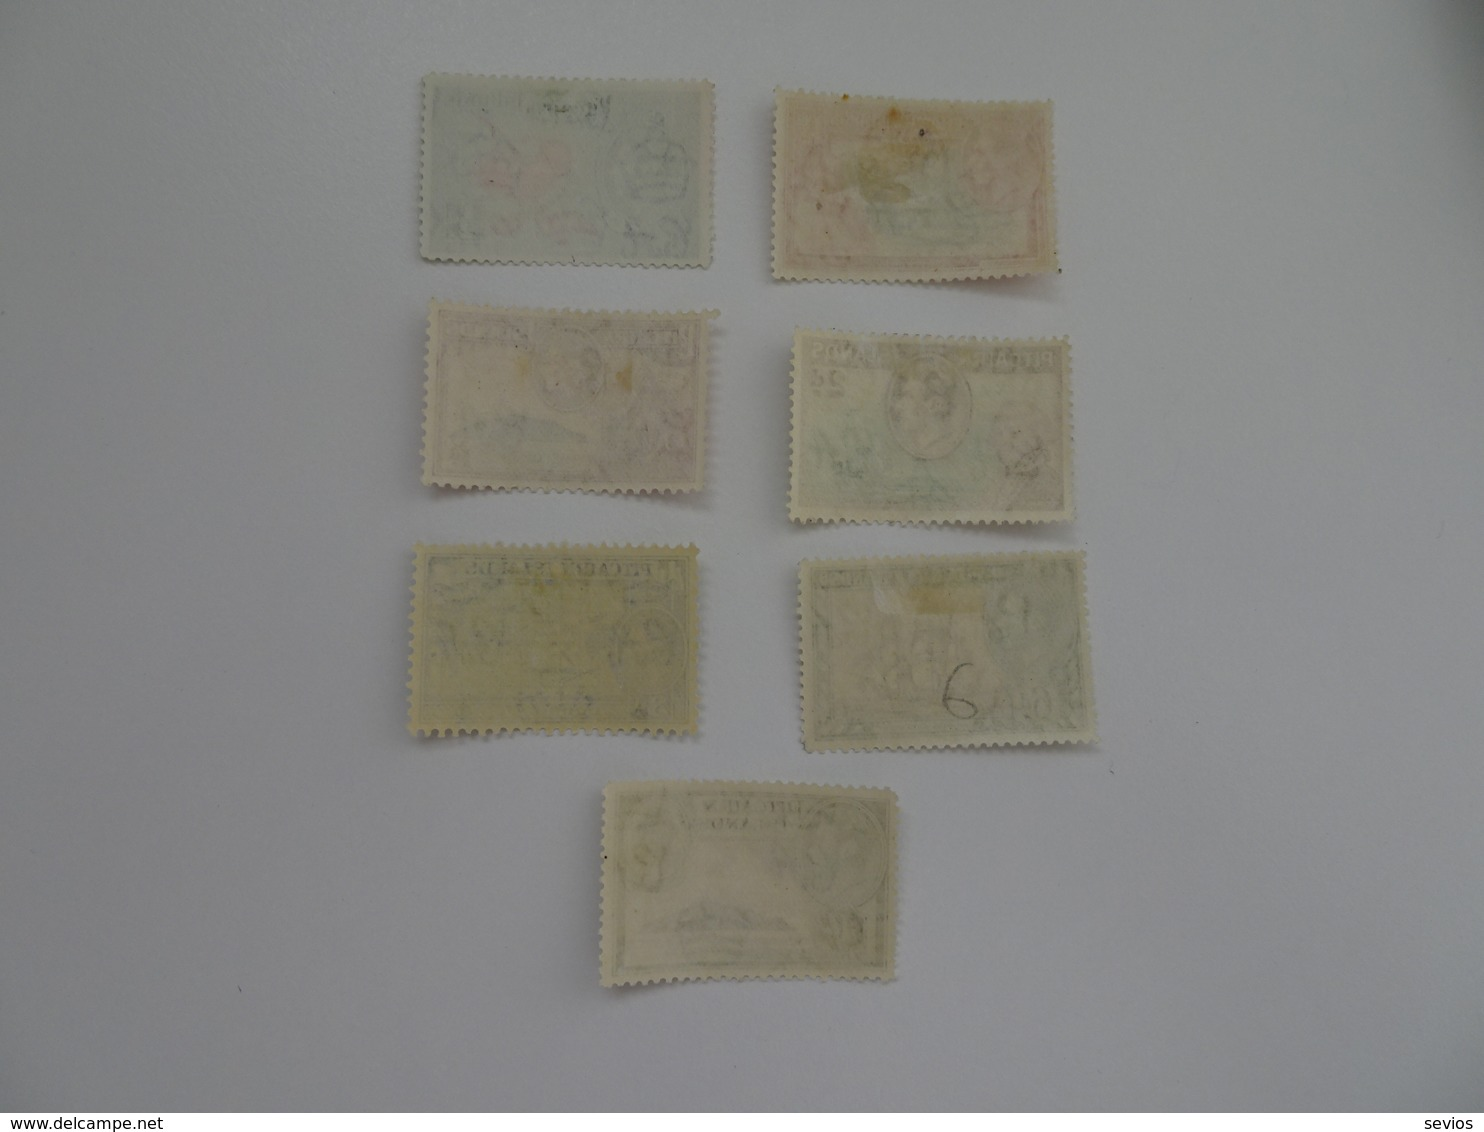 Sevios / Picairne Eilanden / **, *, (*) Or Used - Stamps